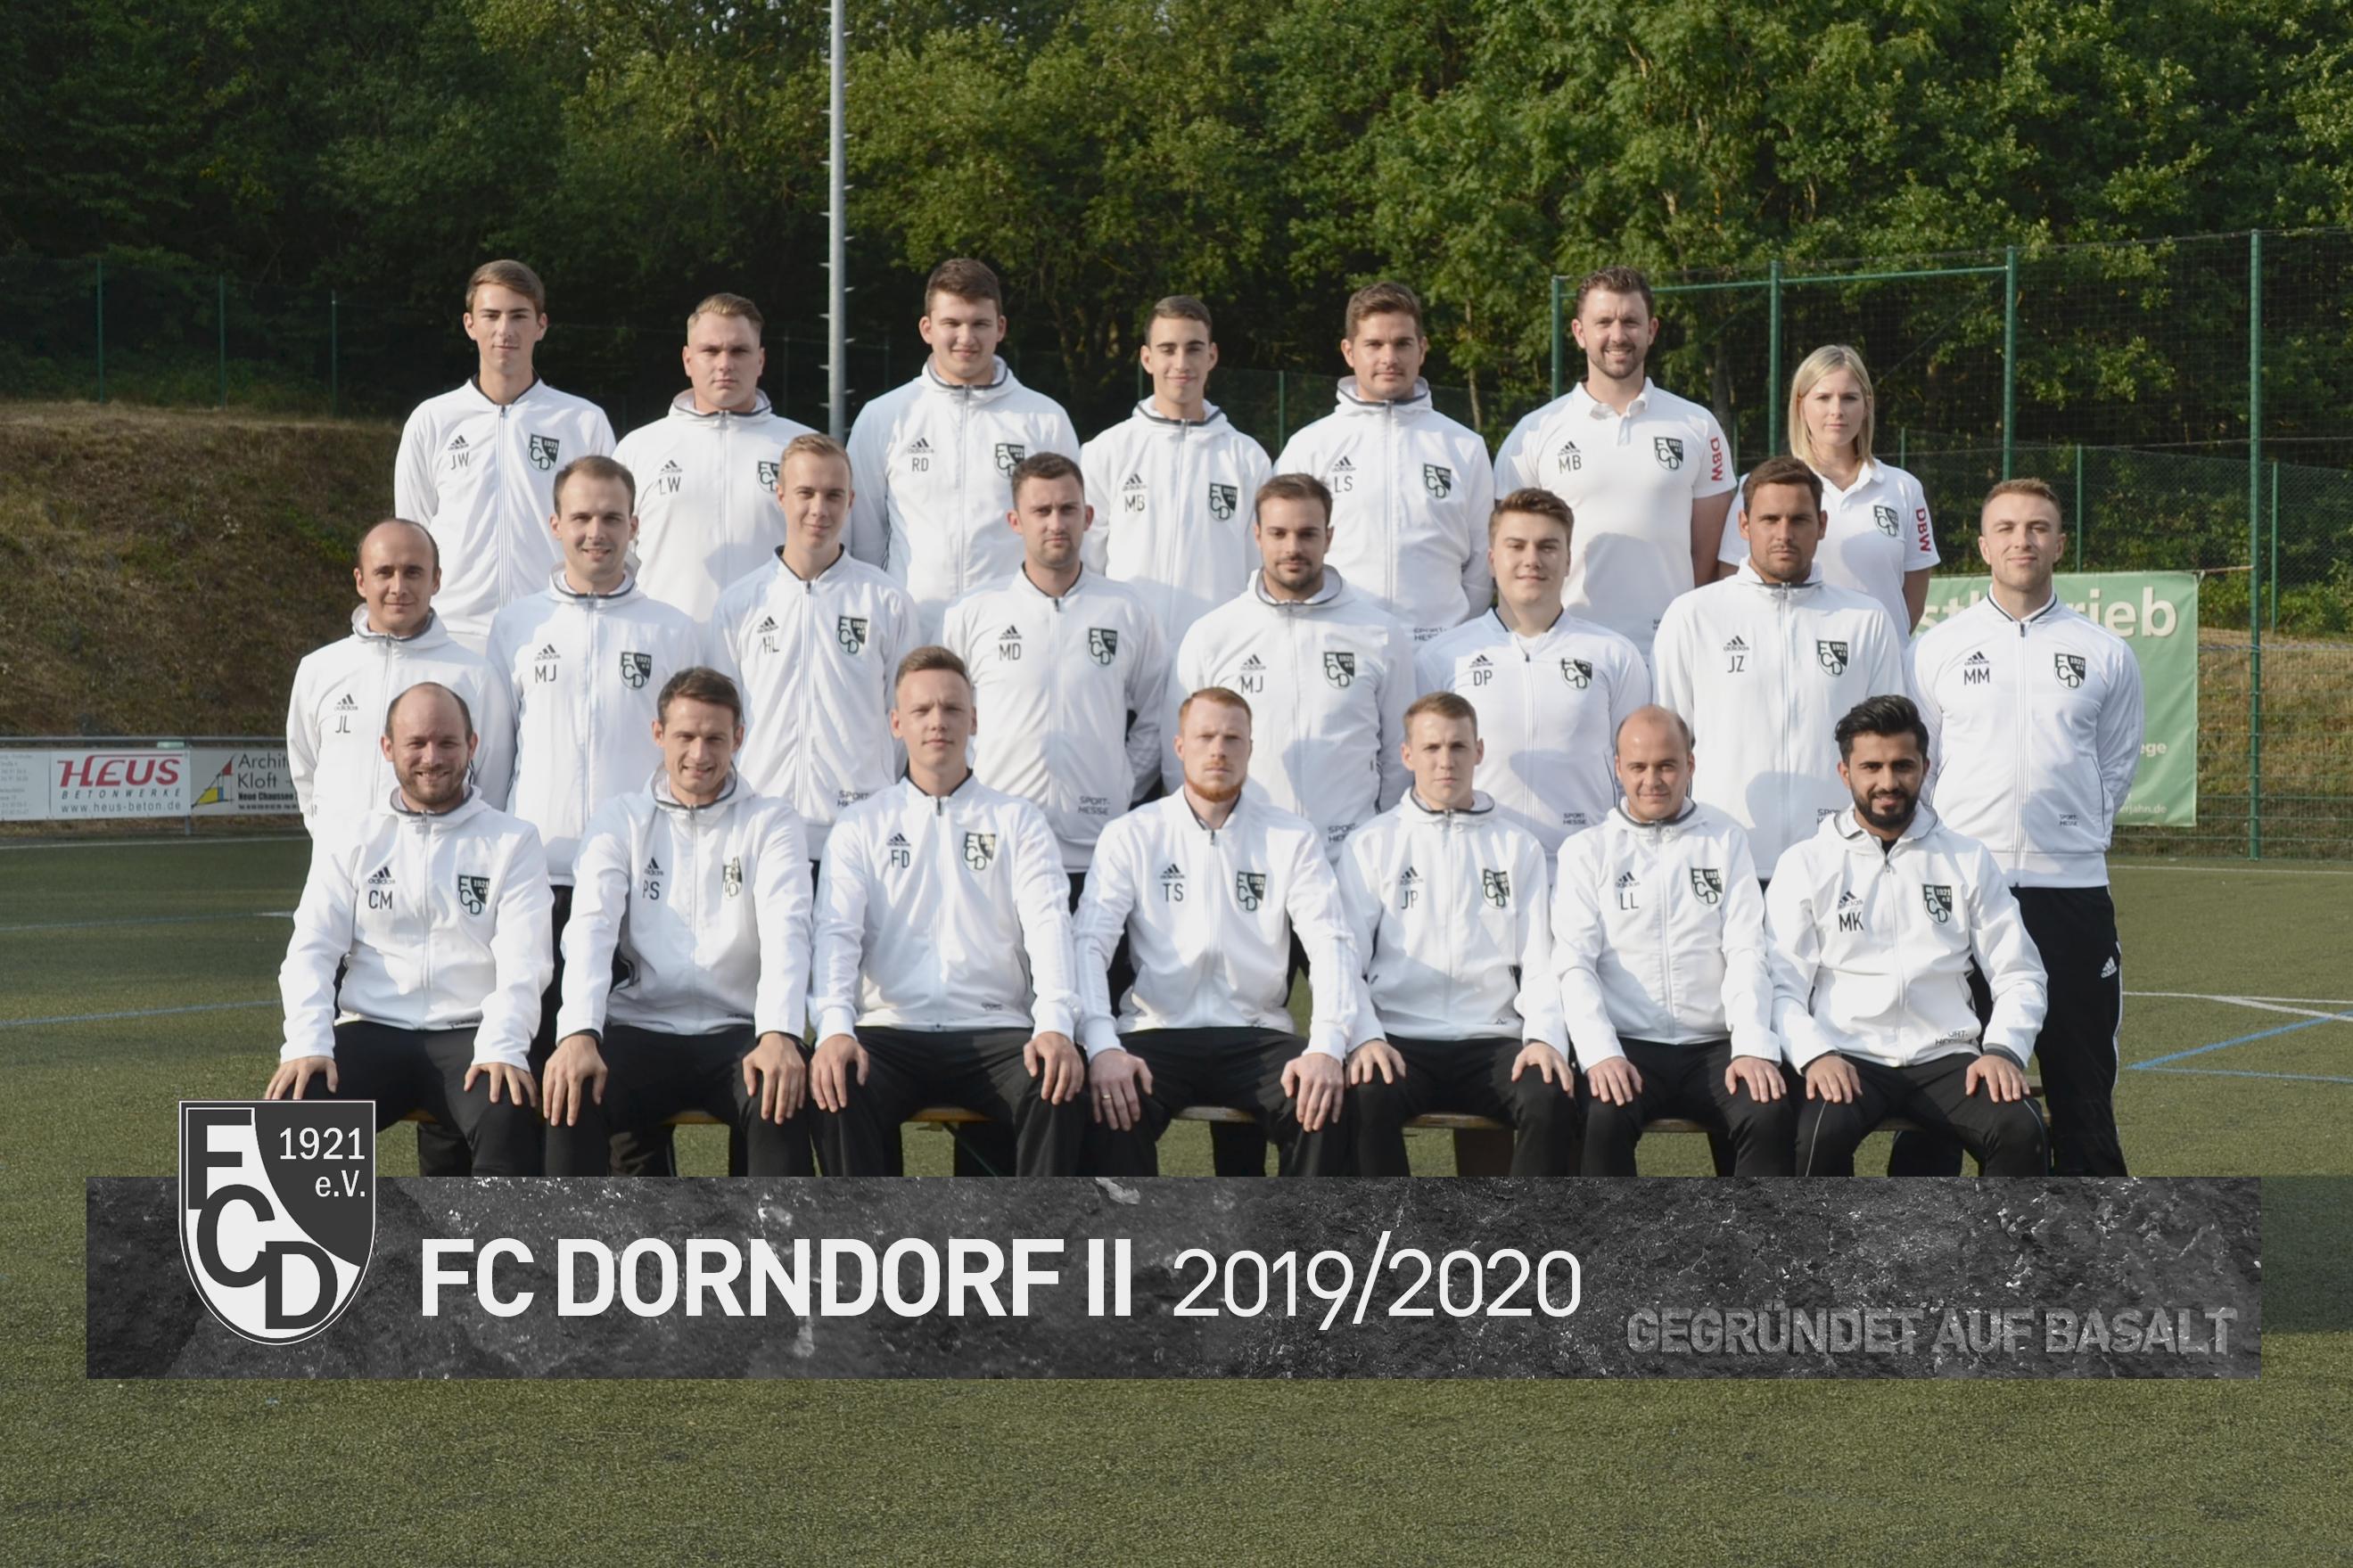 FCD 2 Mannschaftsfoto 2019-2020.jpg